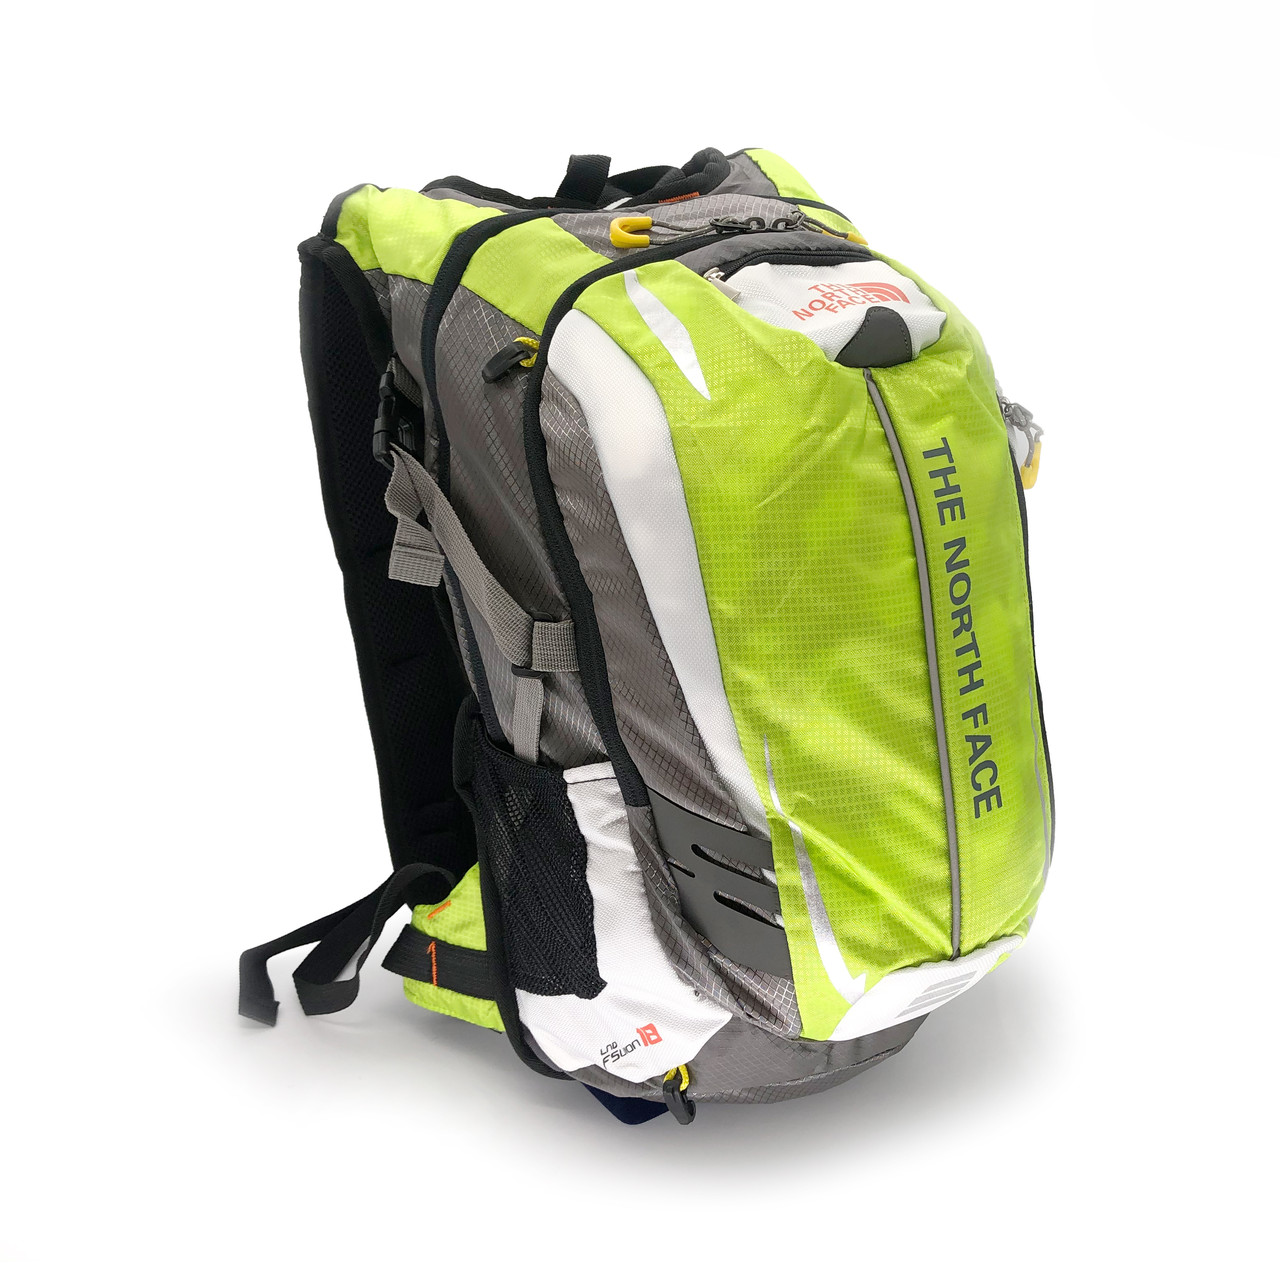 Спортивный рюкзак для бега - фото 2